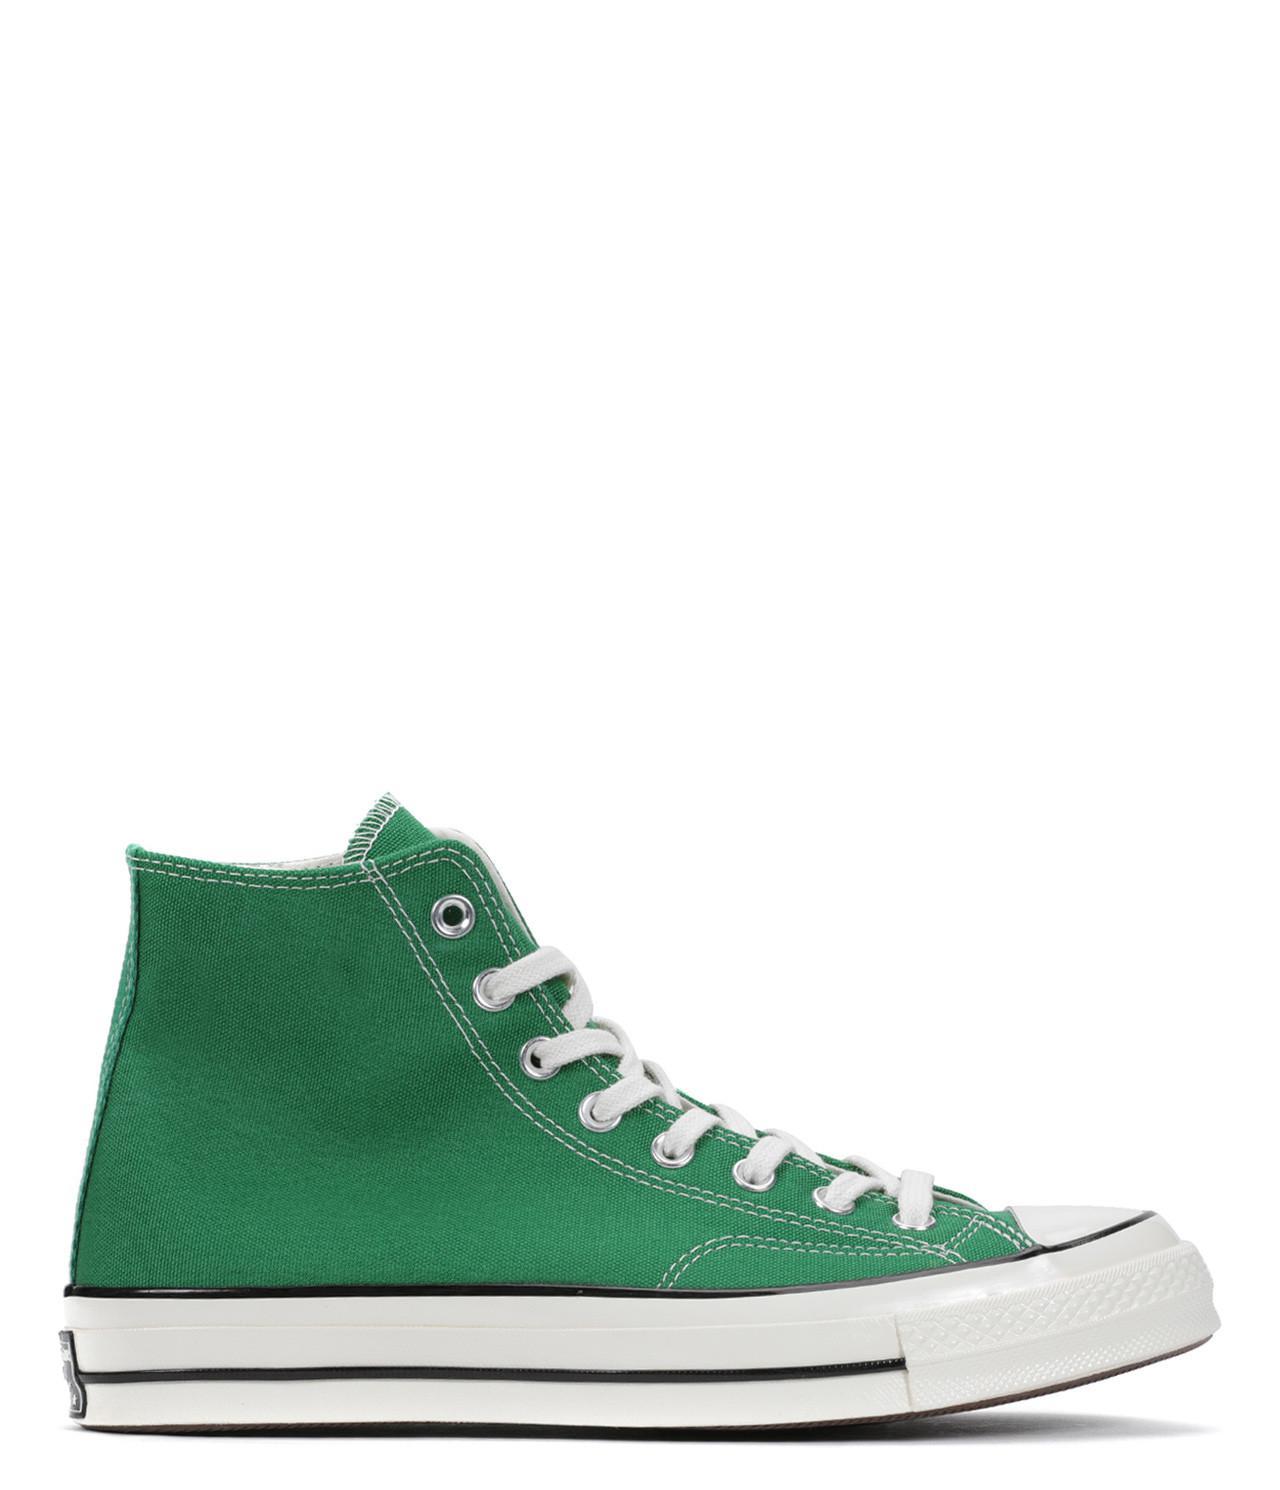 cef4c6640c64ca Converse - Green 1970s Chuck Taylor All Star Canvas High-top Sneakers for  Men -. View fullscreen